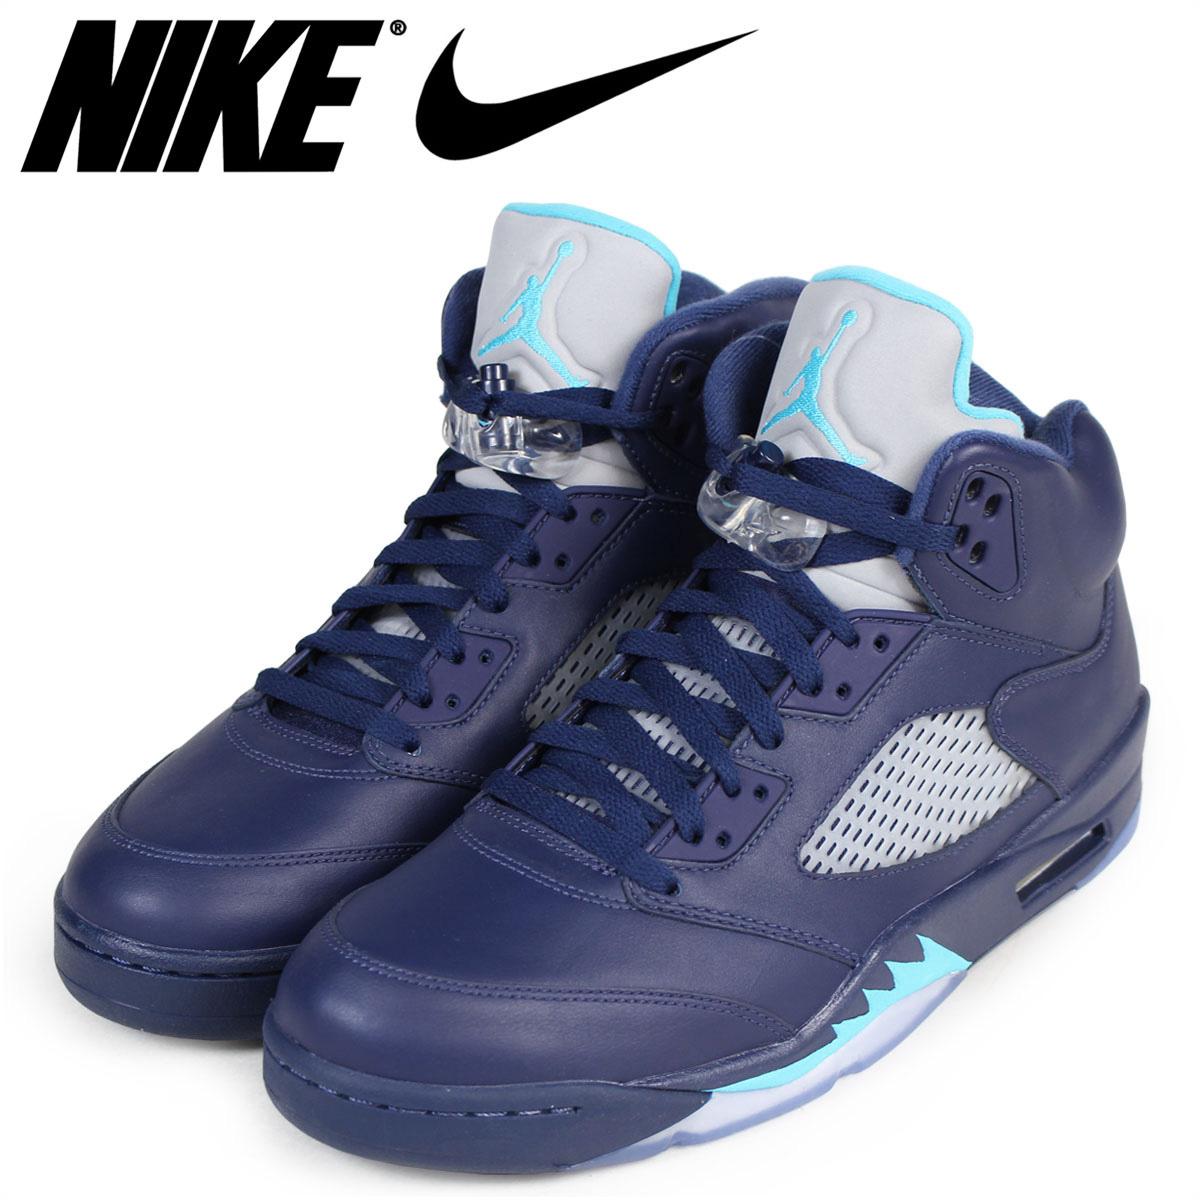 finest selection e8382 0d8c0 NIKE Nike Air Jordan 5 nostalgic sneakers AIR JORDAN 5 RETRO HORNETS  136,027-405 men's shoes blue